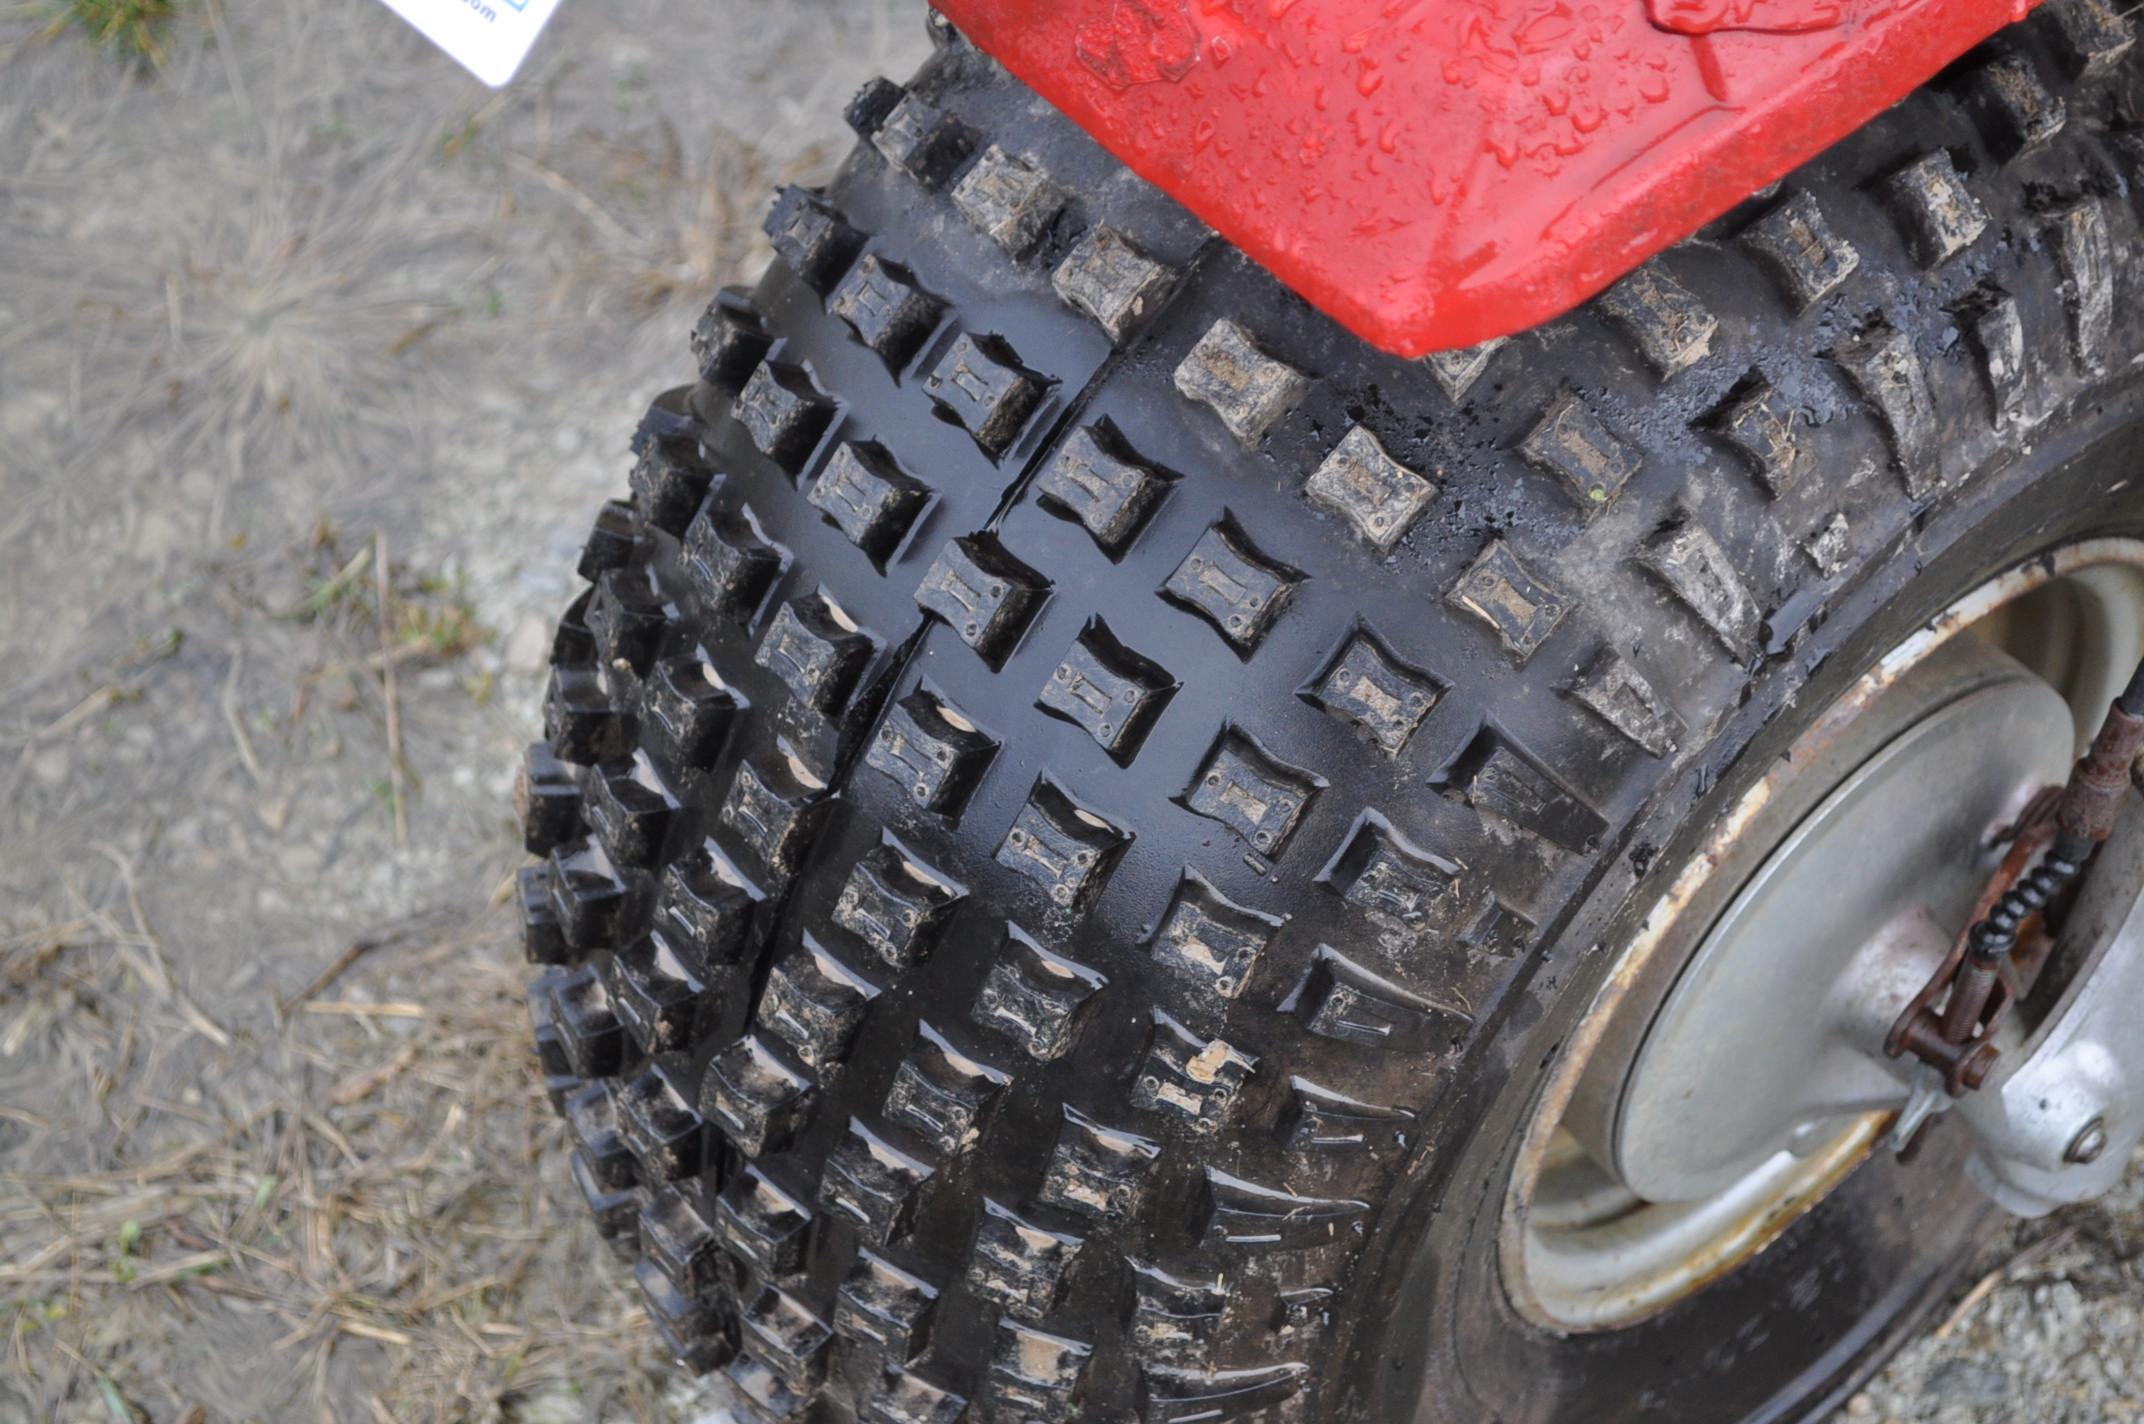 Honda Big Red 3-wheeler, new 25 x 12.00-9 tires - Image 5 of 8